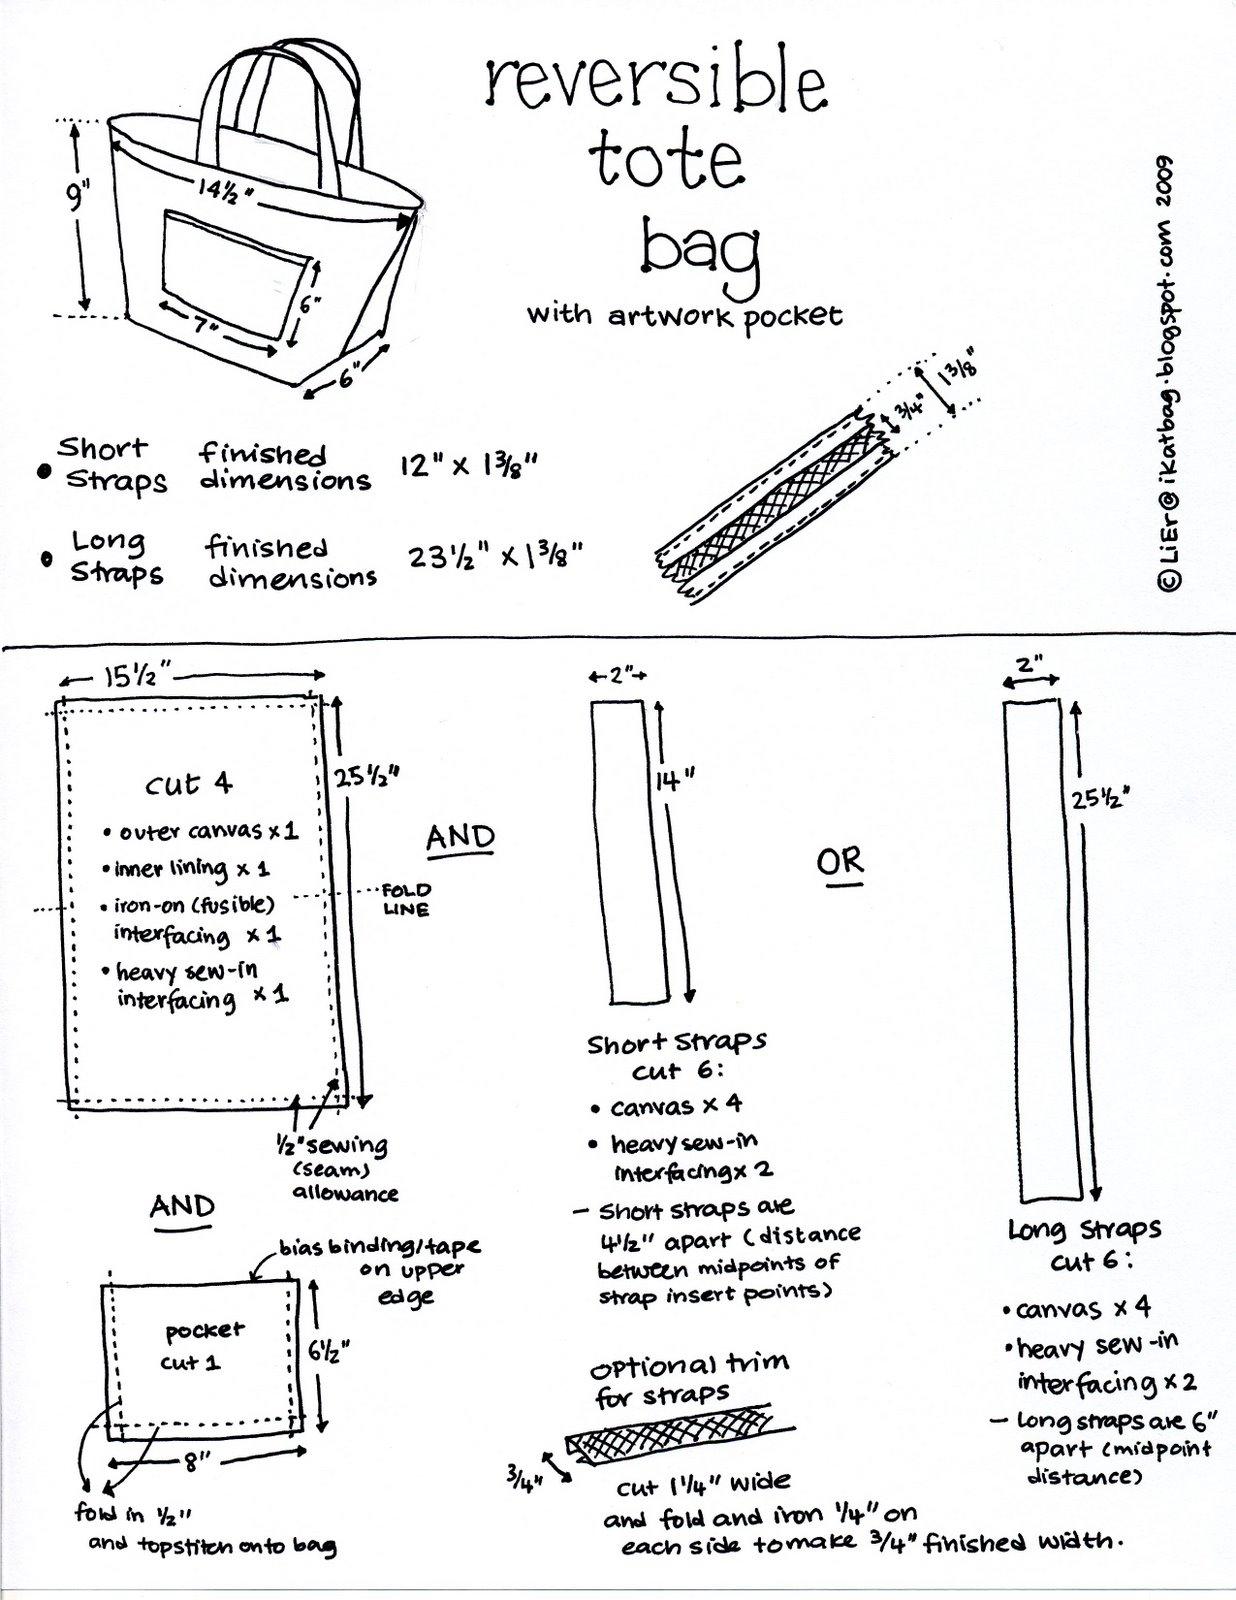 Long Handled Reversible Tote Bag - Free Pattern | PatternPile.com ...